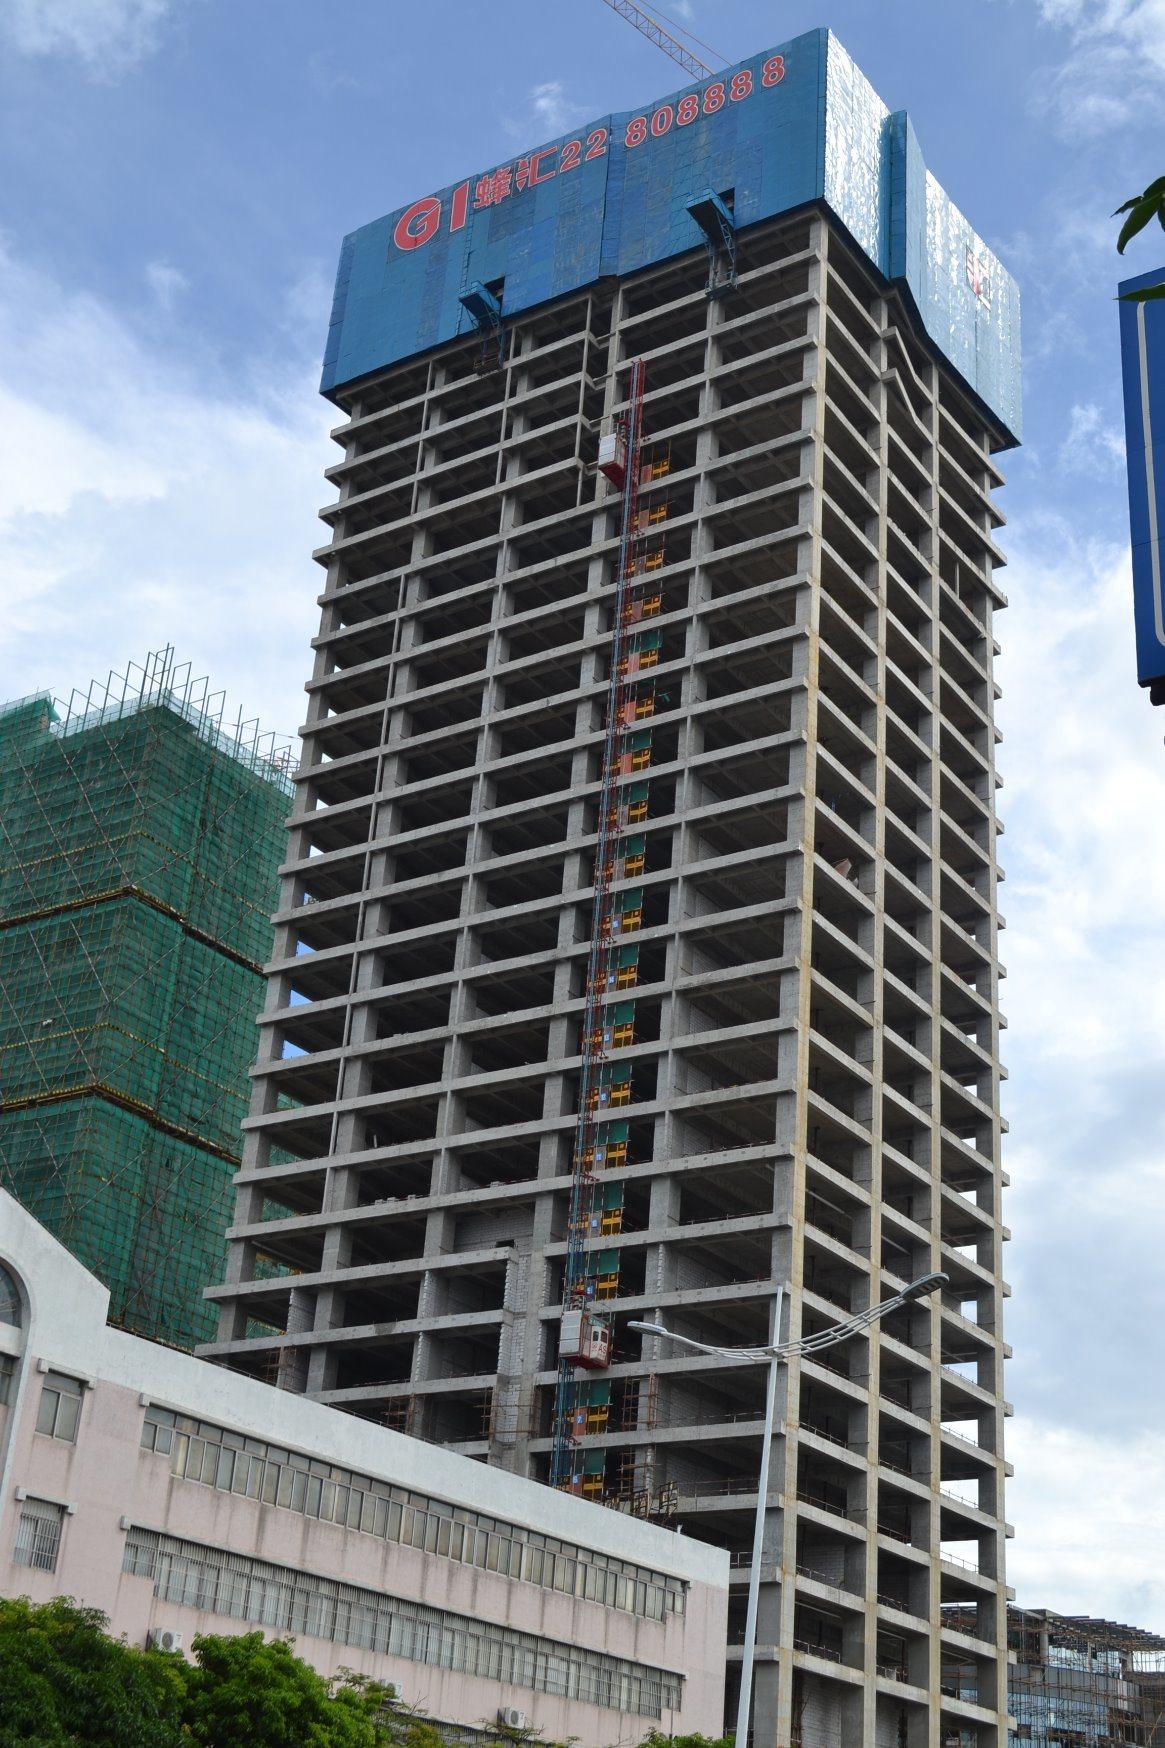 6t Qtz80 (6012) Hydraulic Construction Equipment Tower Crane